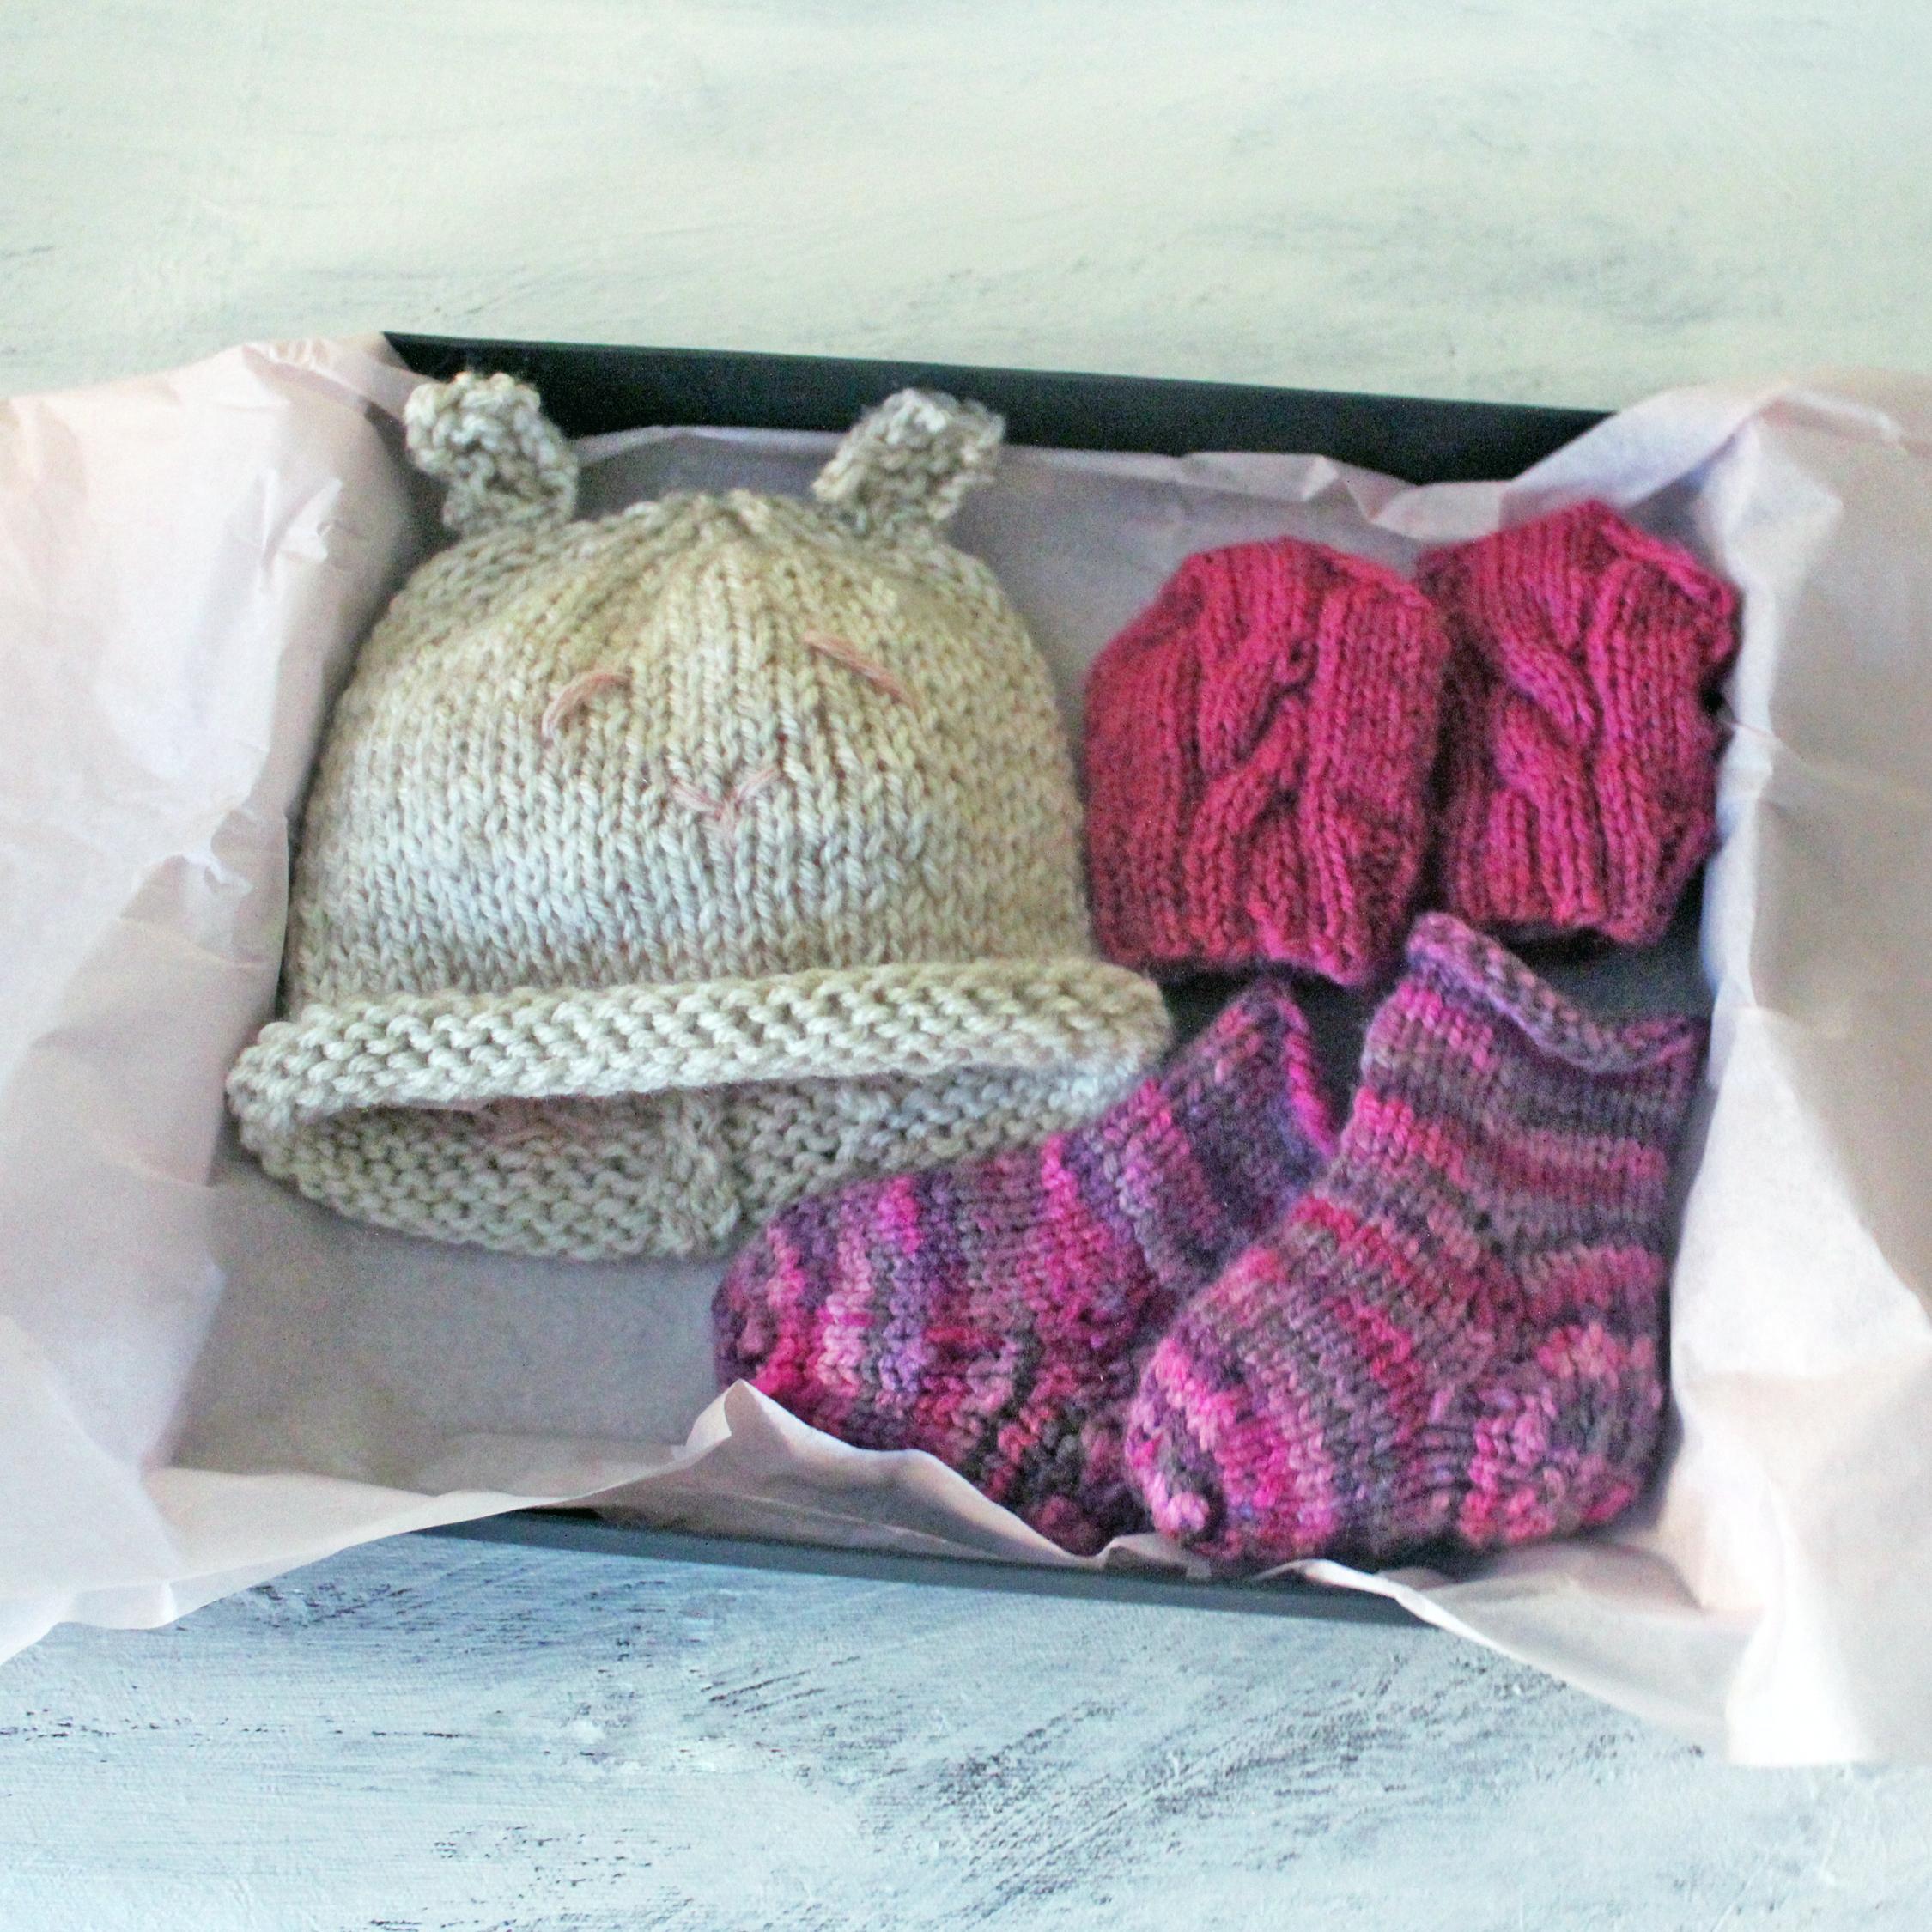 baby-knitting-3